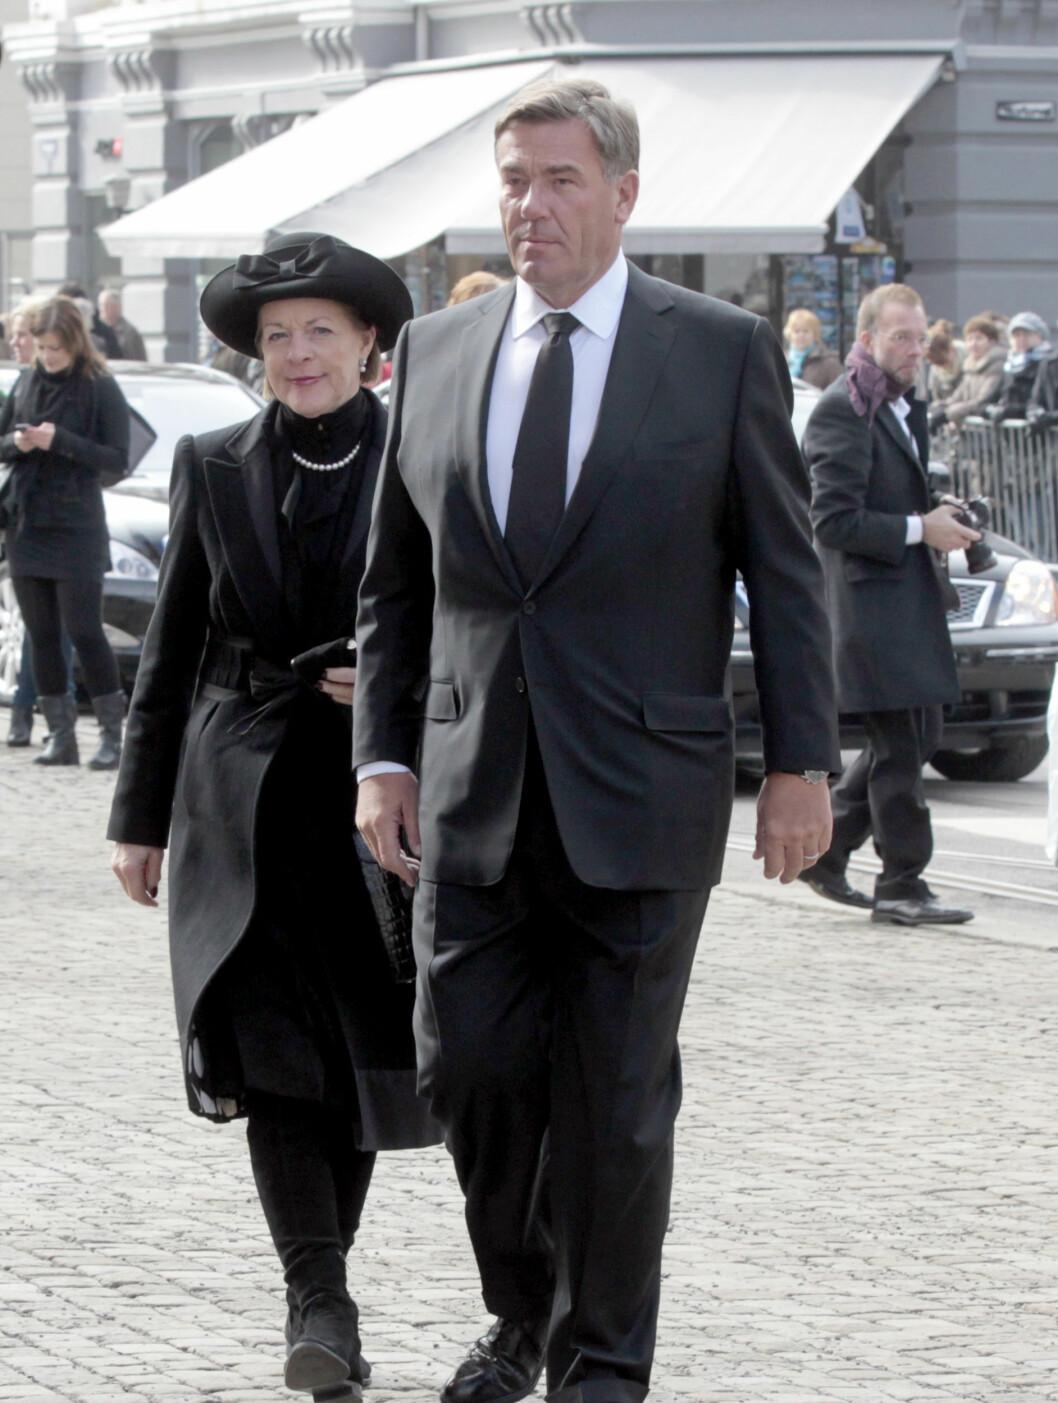 KLEDD I SORT: Stein Erik Hagen og Mille Marie Treschow ankommer Wenche Foss sin bisettelse. Foto: Scanpix